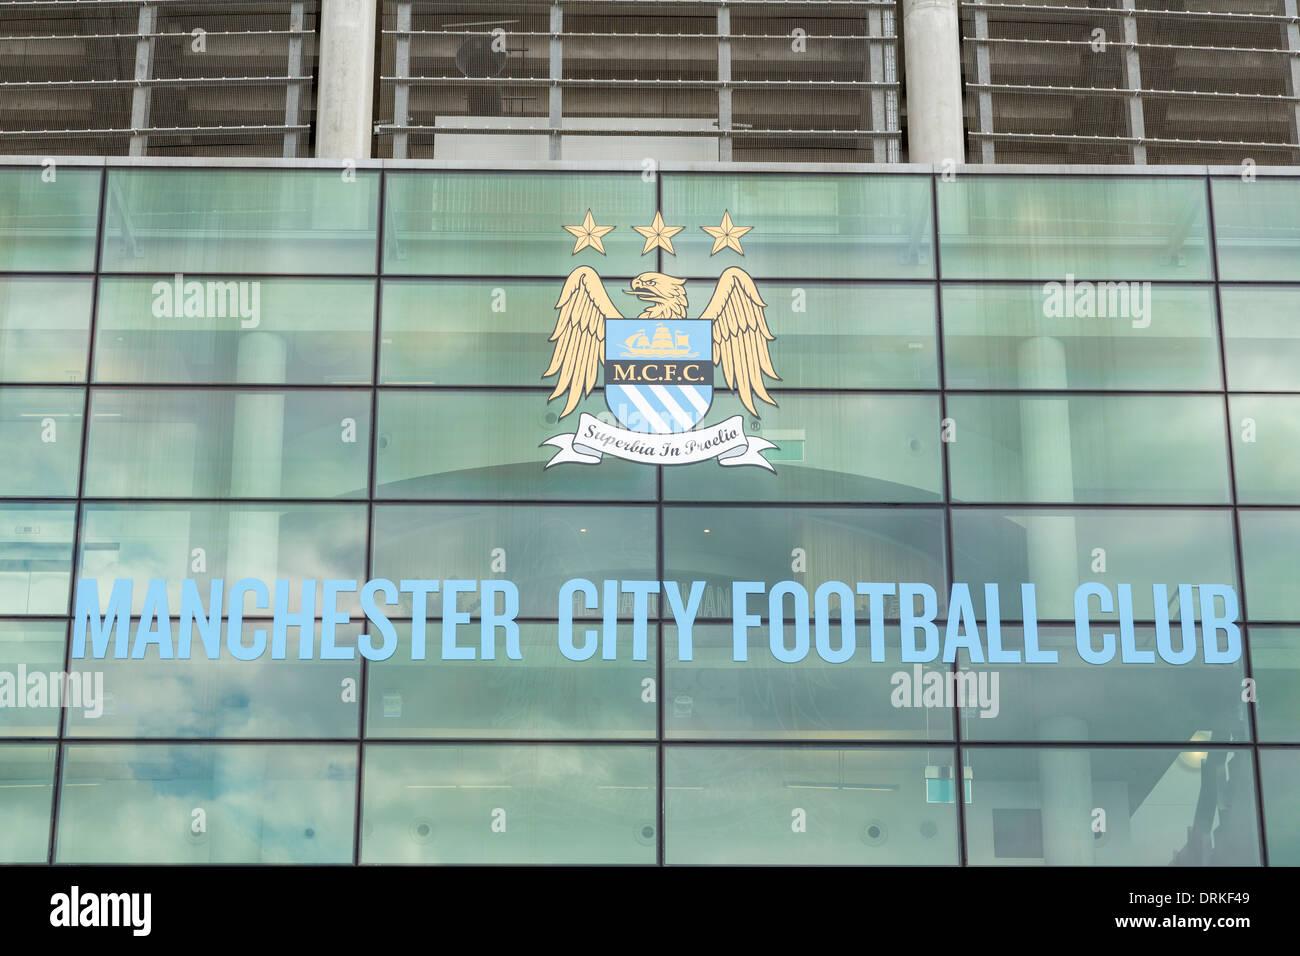 Manchester City Etihad football stadium - Stock Image